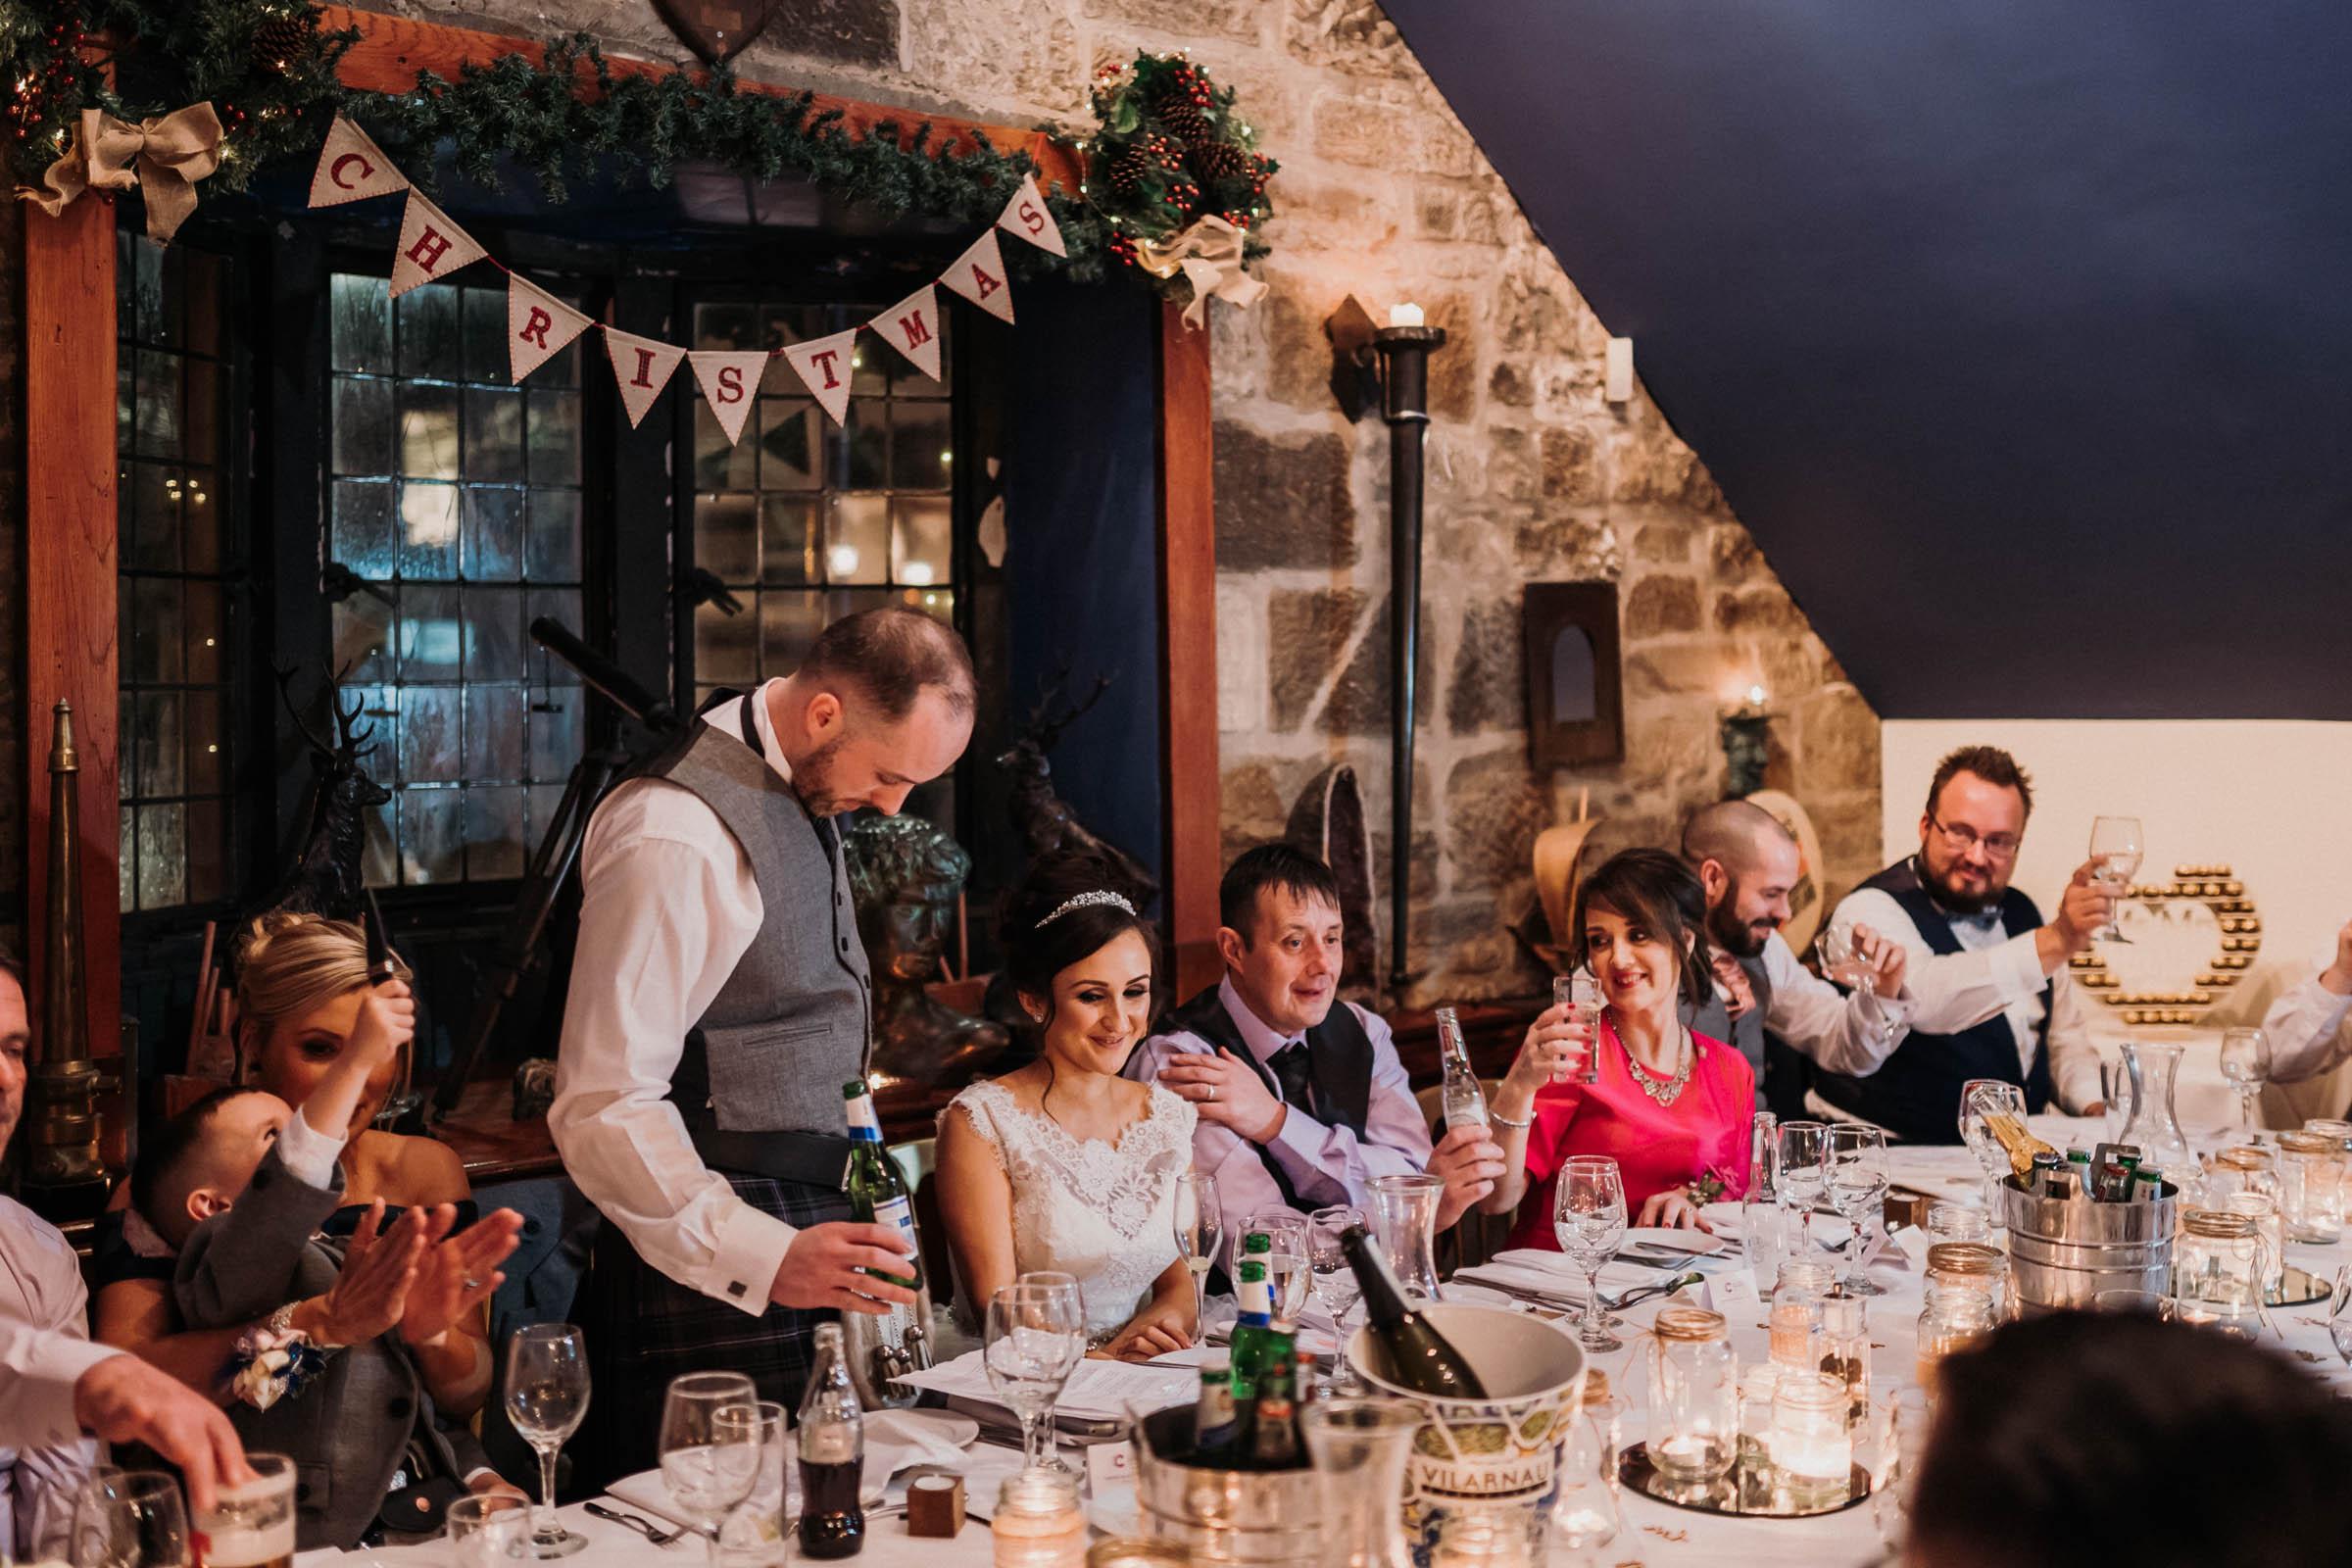 Oran-Mor-Wedding-Photographer-DearlyPhotography (38 of 55).jpg